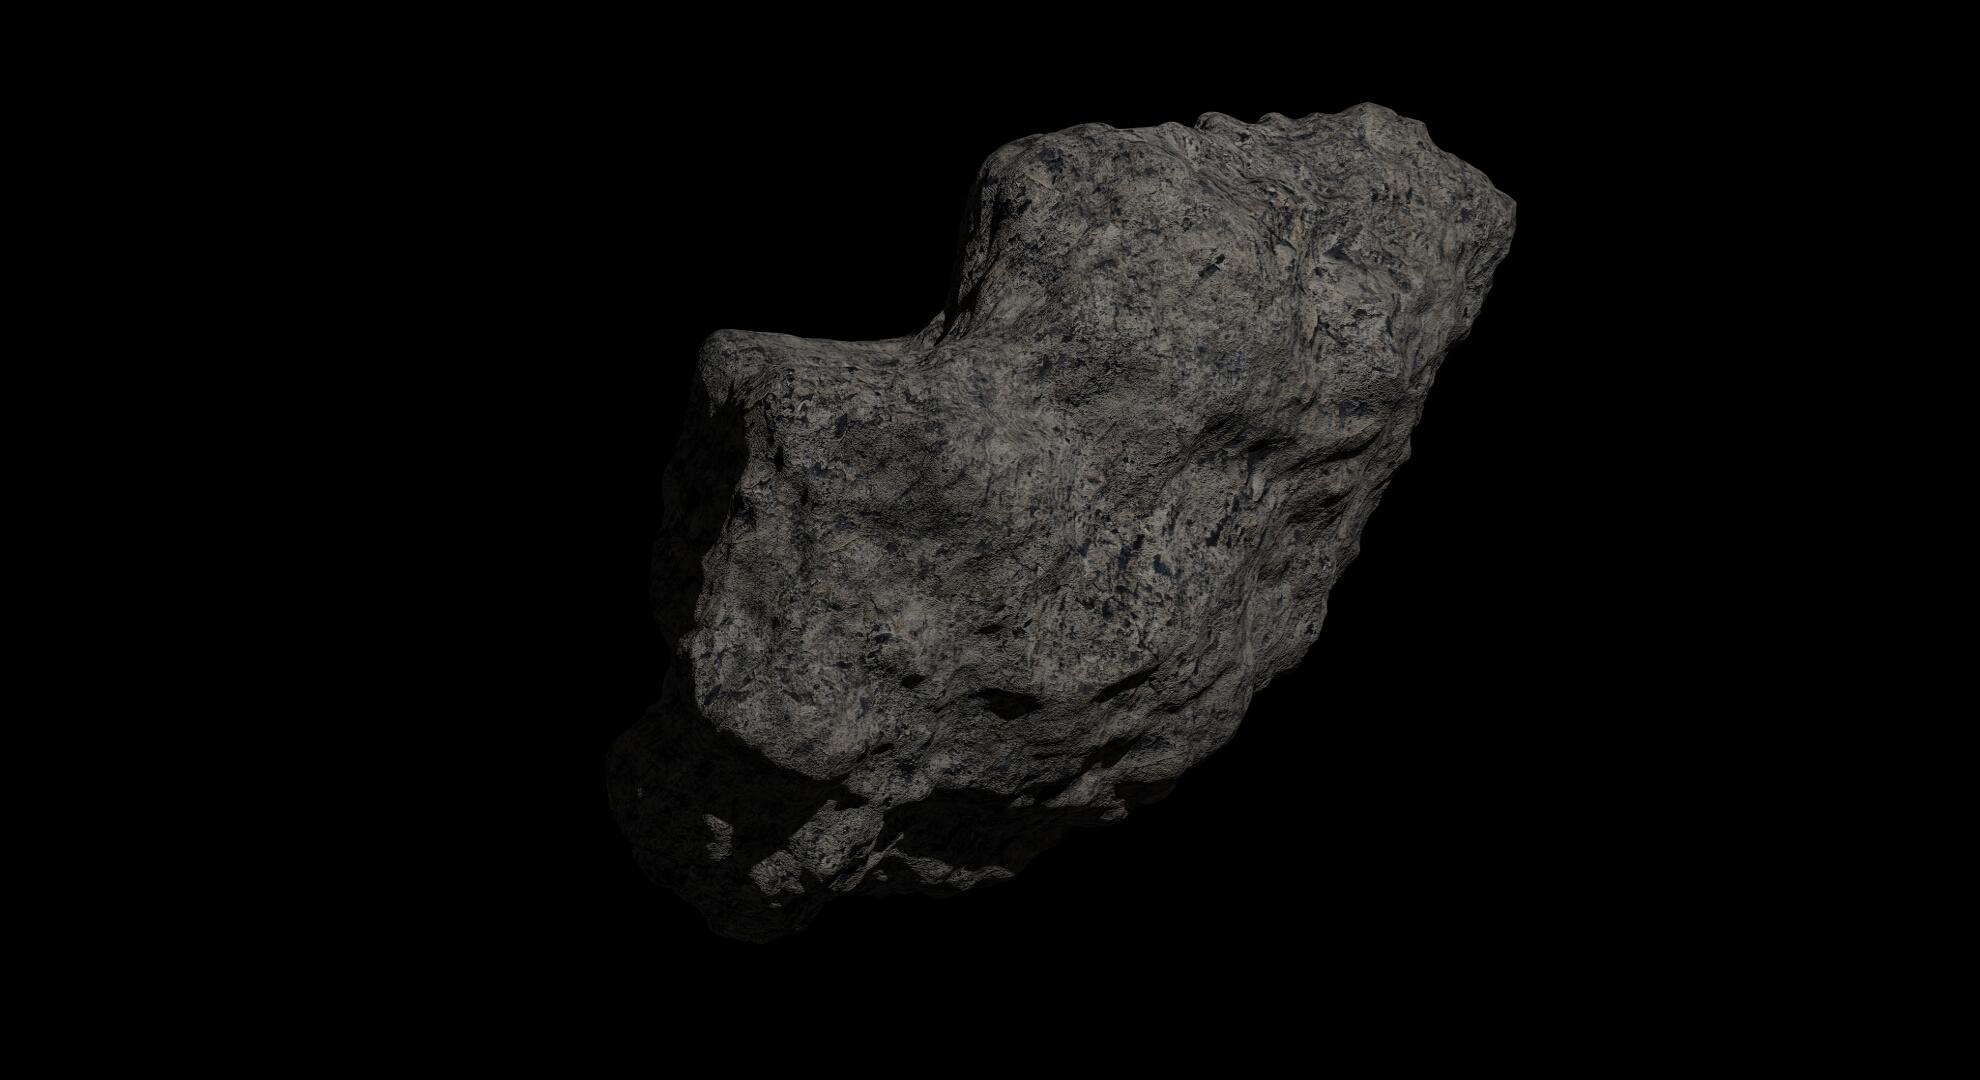 fantasy asteroid 2 3d model 3ds blend dae fbx obj 267192